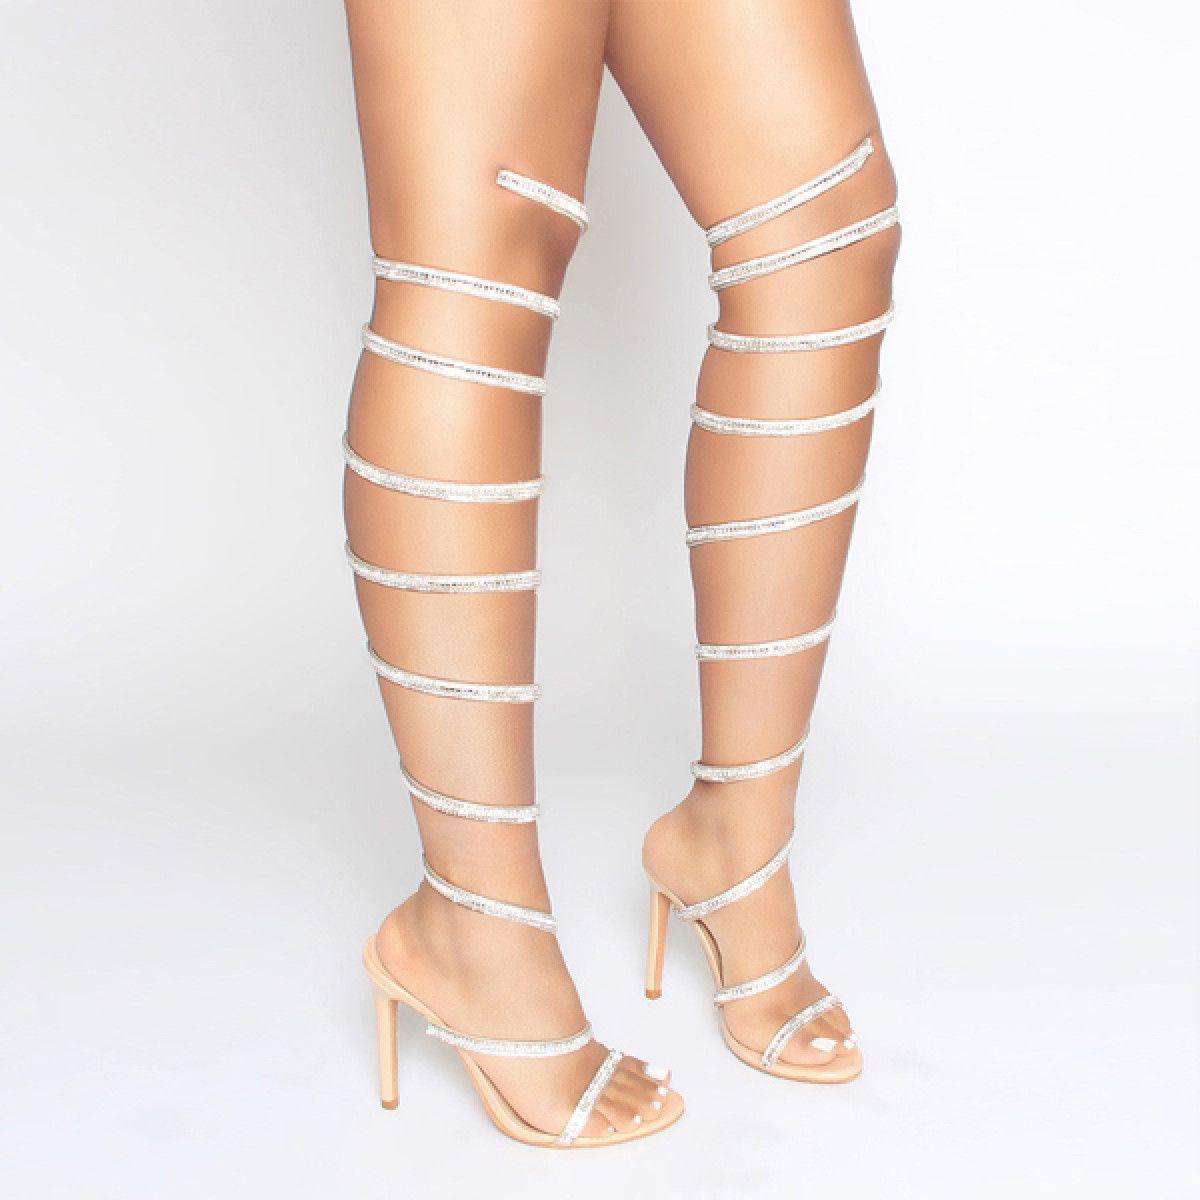 bc198e8856 UK Online Women's Footwear Destination : Simmi Shoes Simmi Shoes, Footwear,  High Heels,